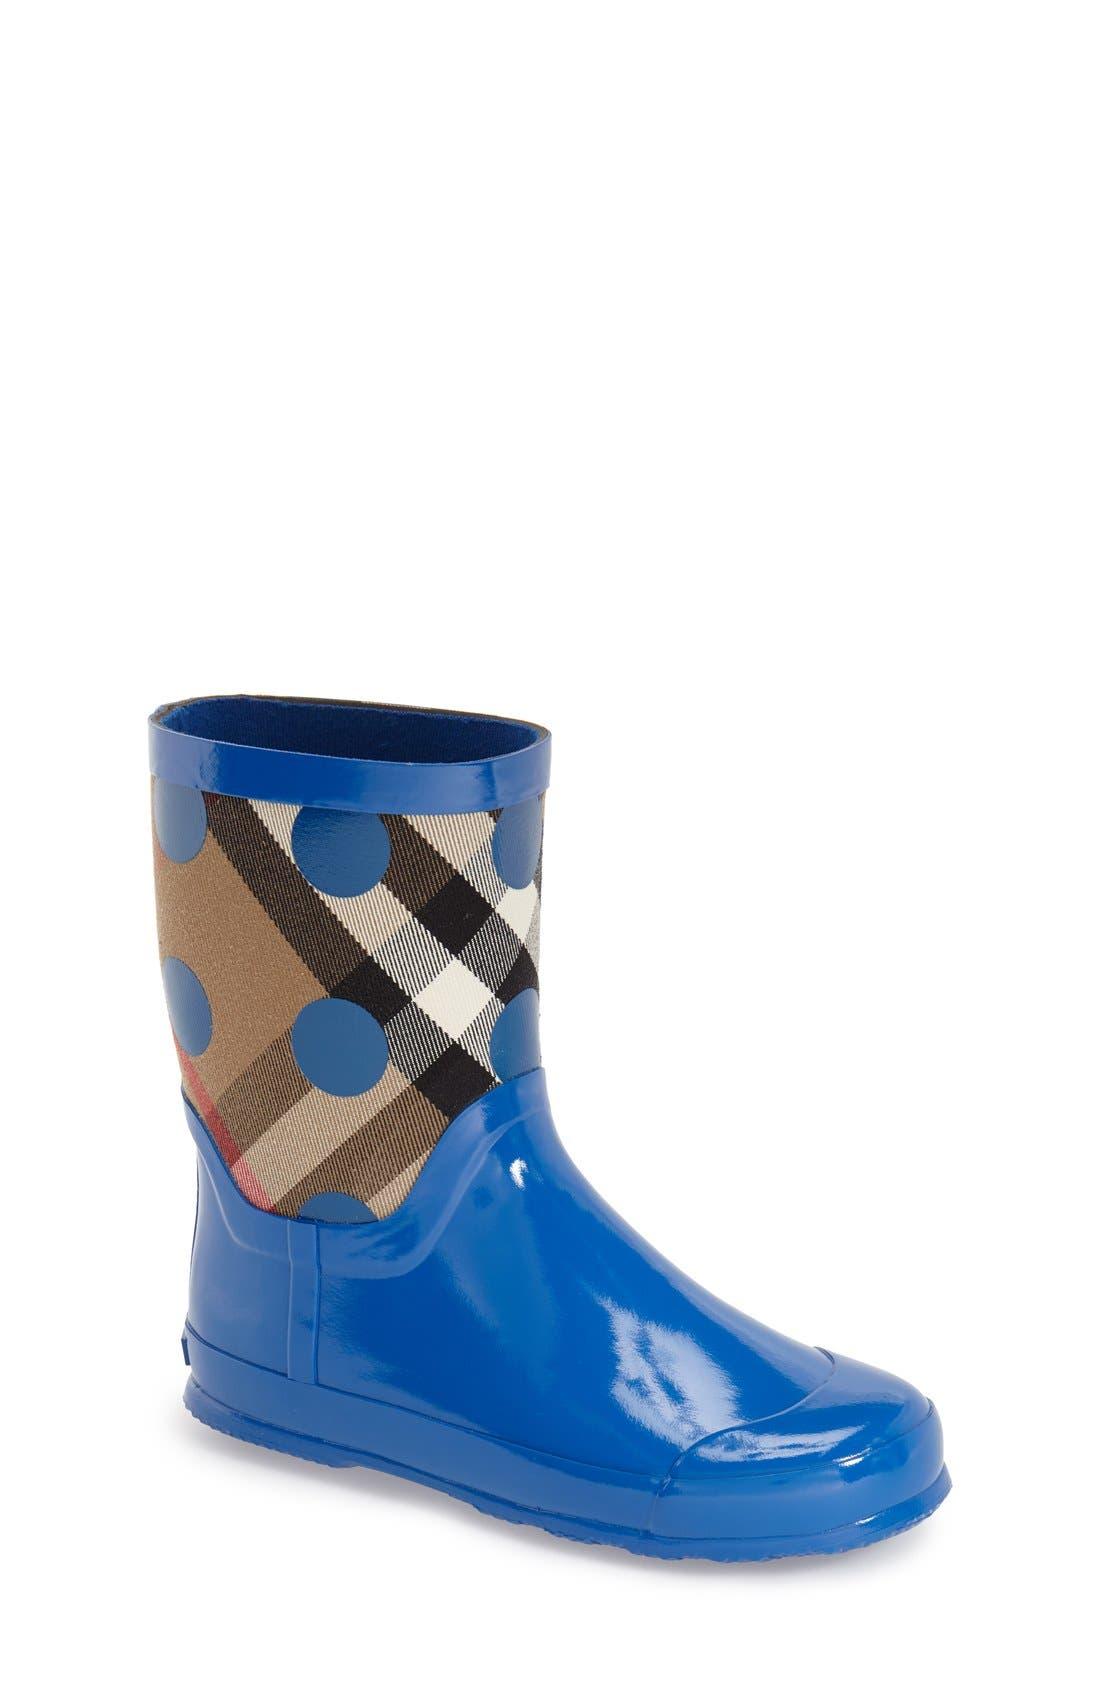 Ranmoor Waterproof Rain Boot,                         Main,                         color, 424